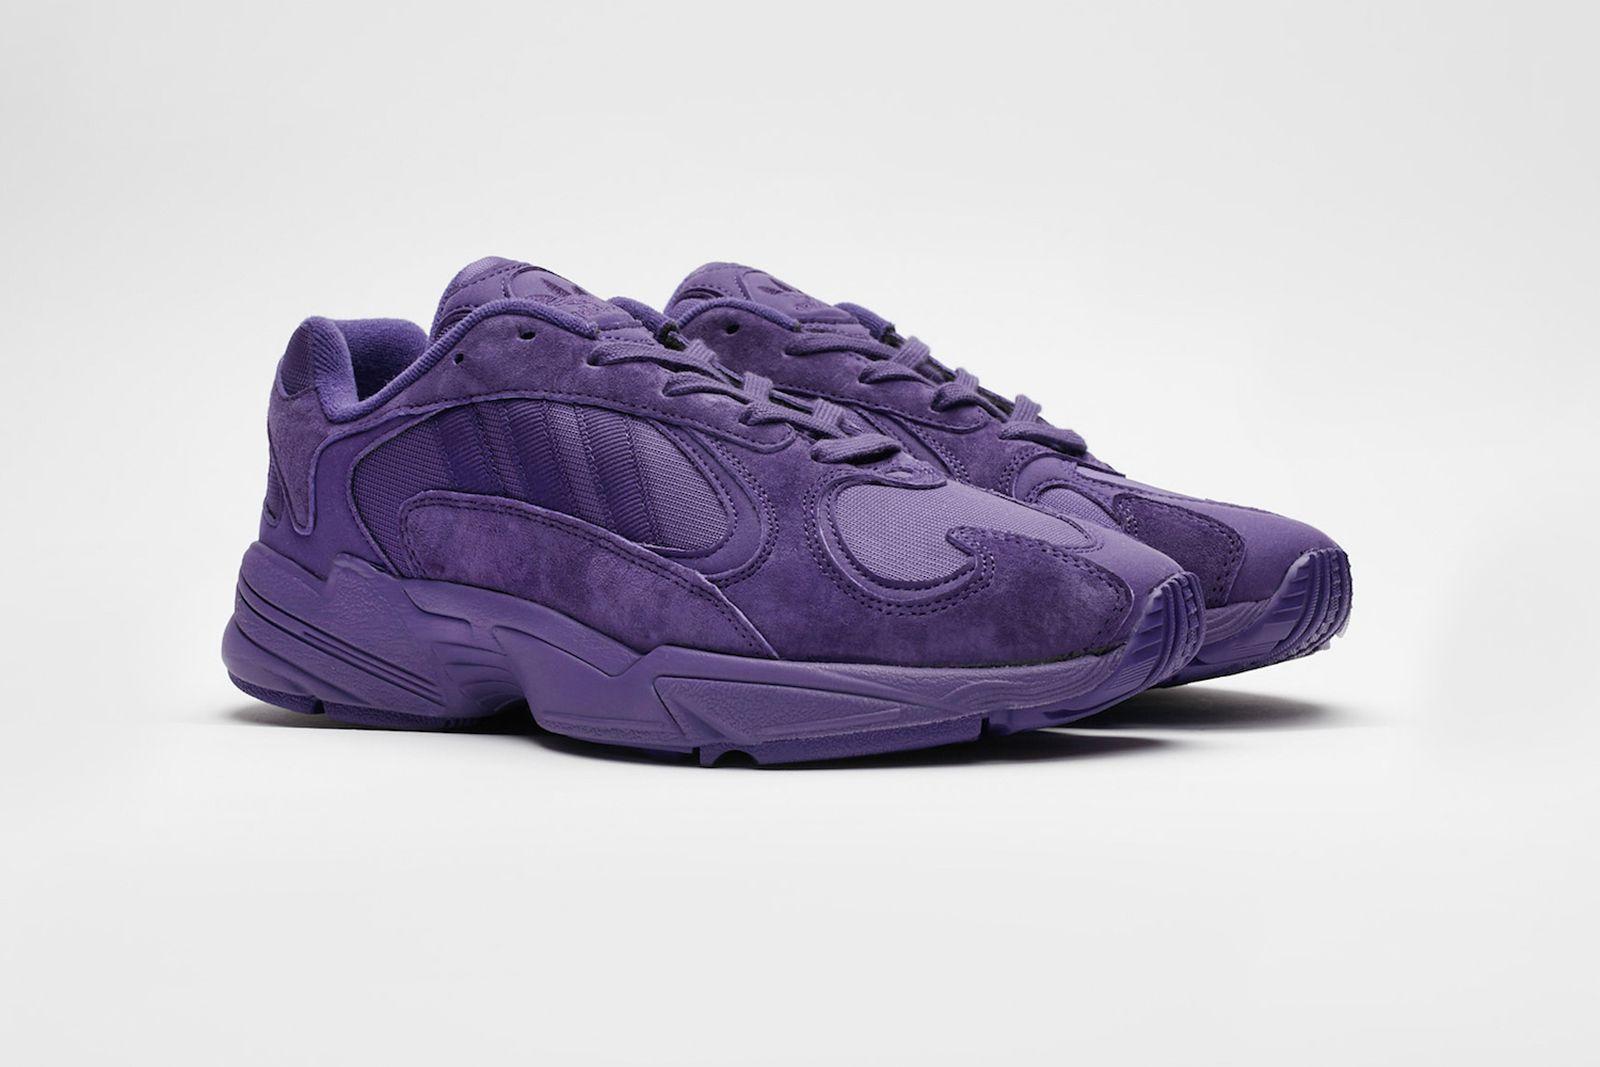 sneakersnstuff adidas originals yung 1 grey and unity purple release date price info adidas Originals Yung-1